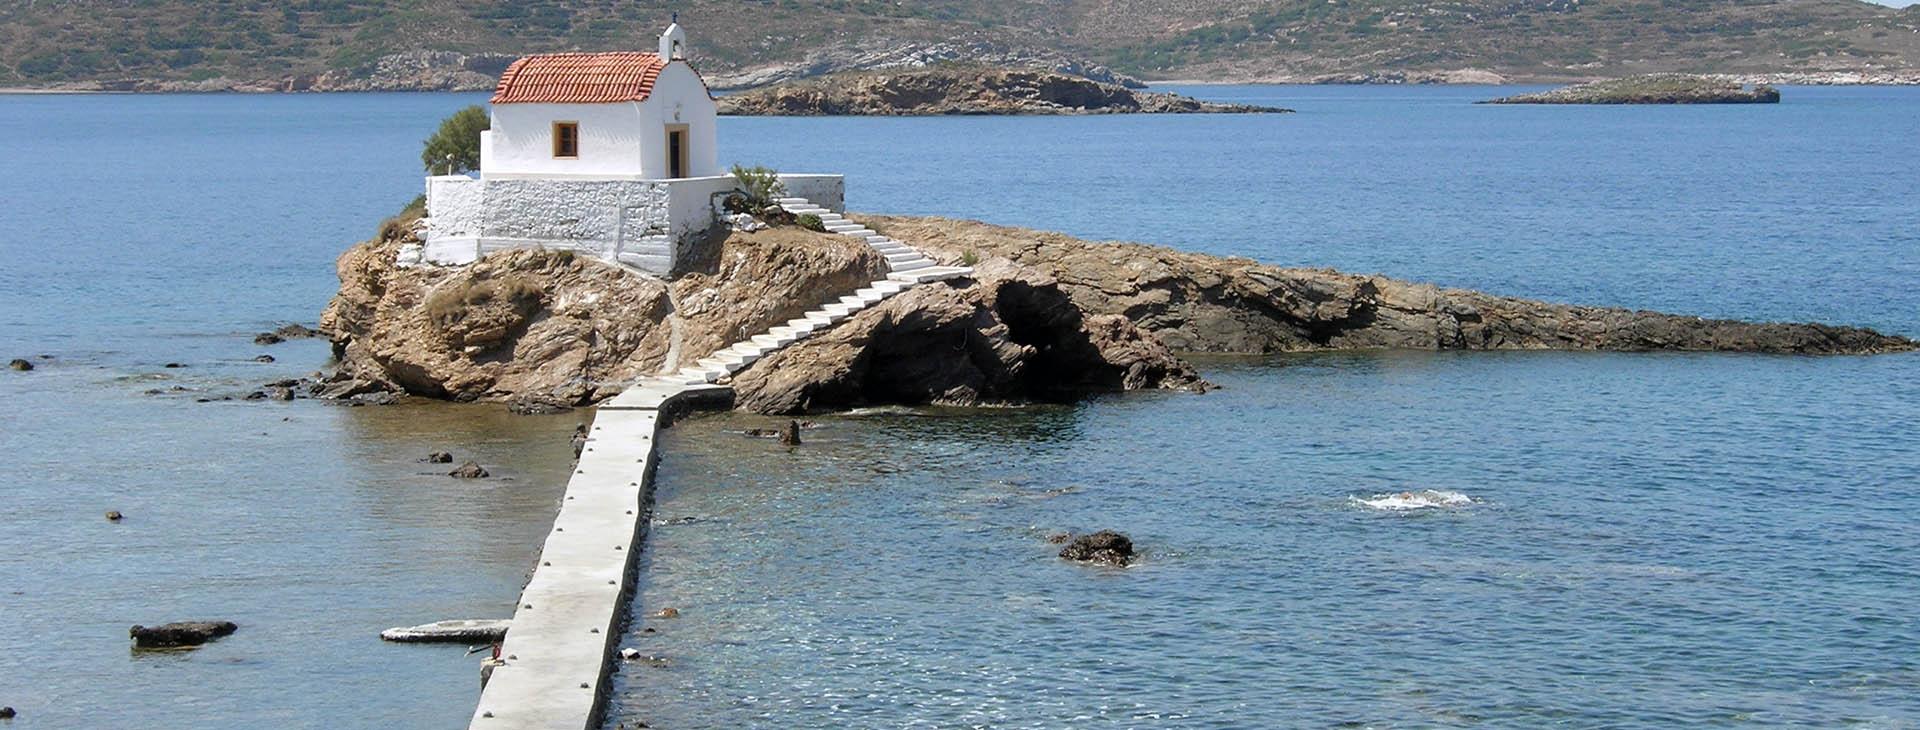 Agios Nikitas, Leros island